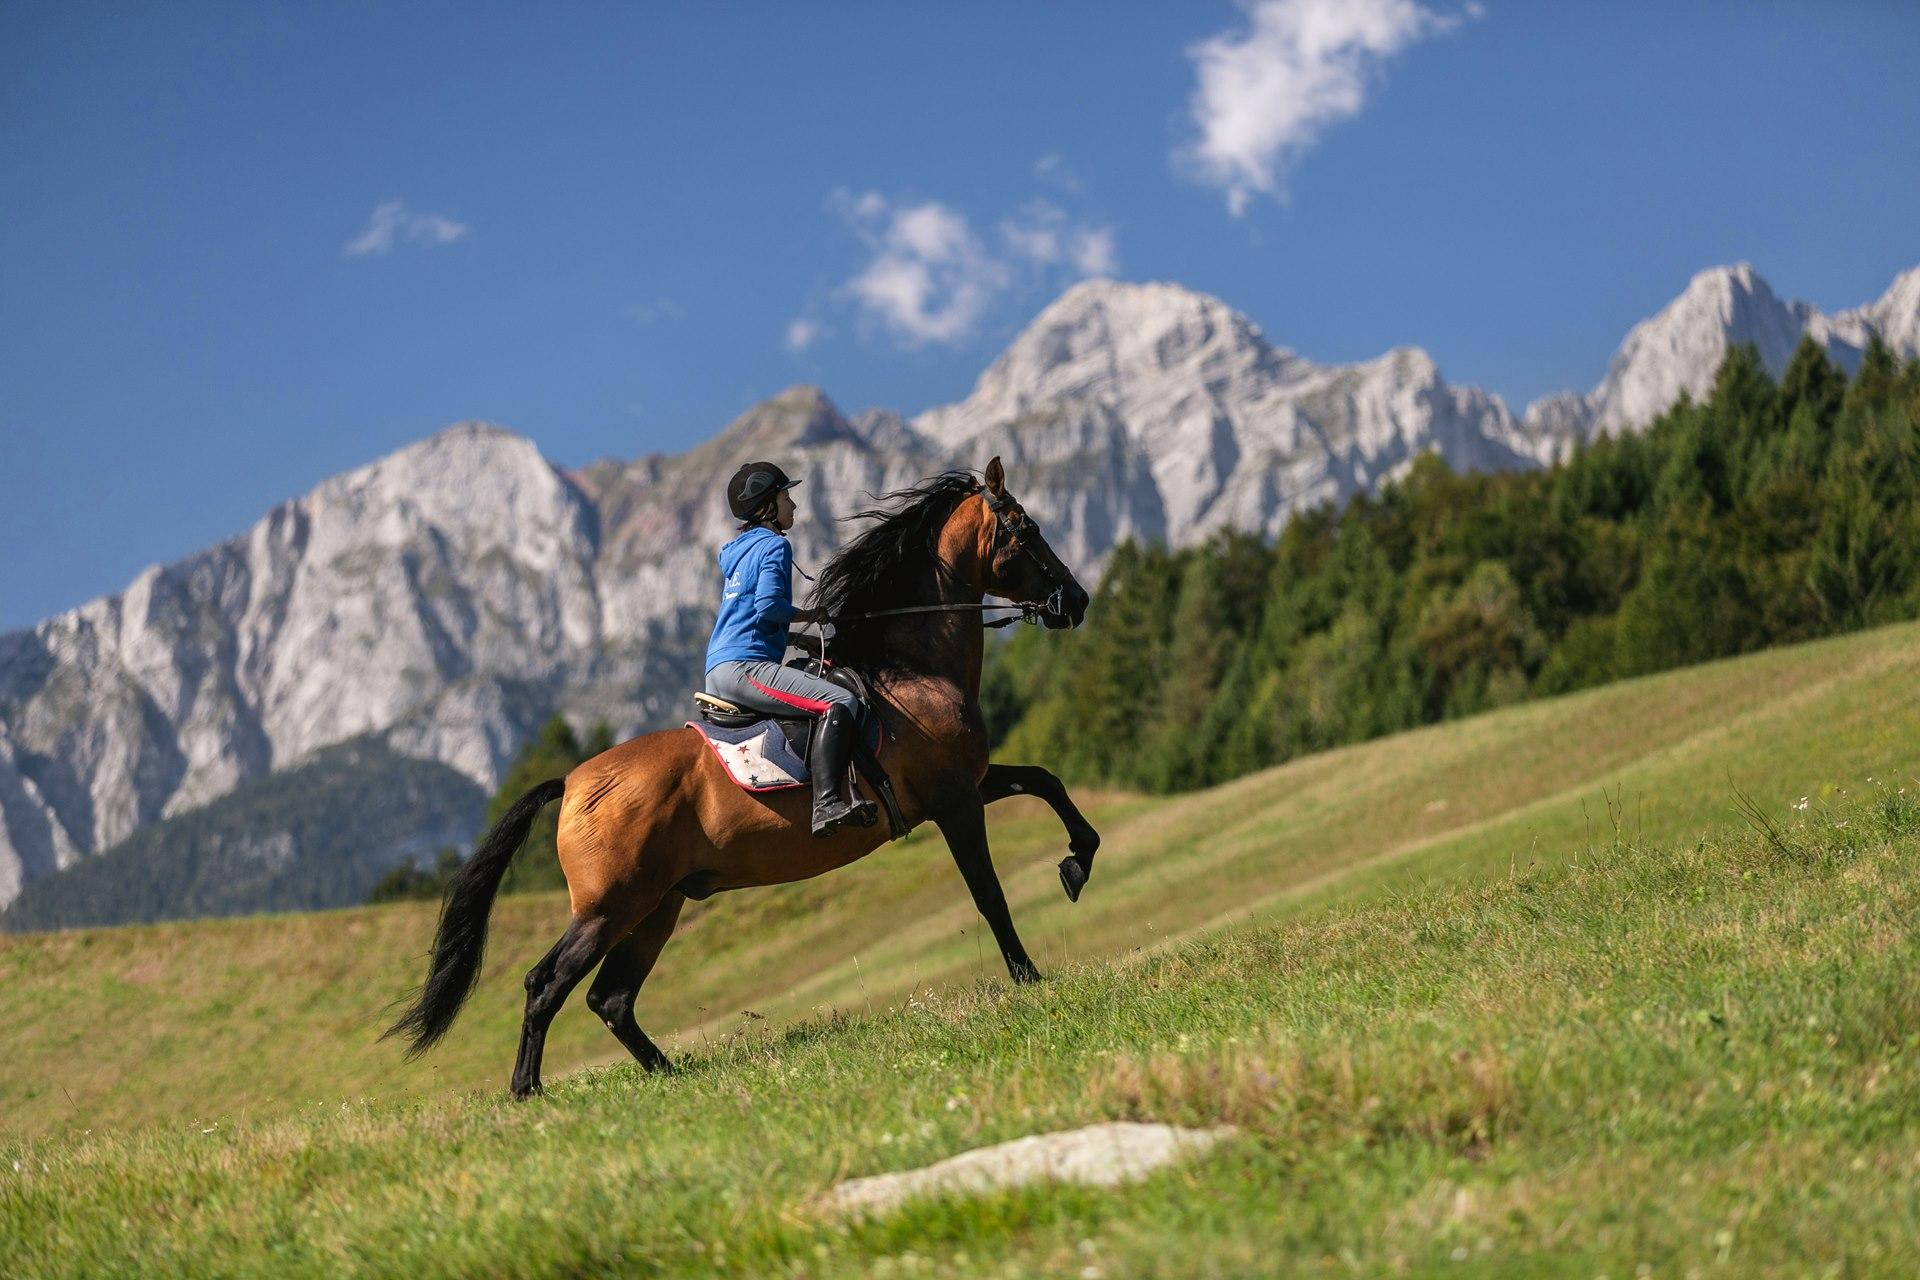 HORSEBACK RIDING IN THE DOLOMITES